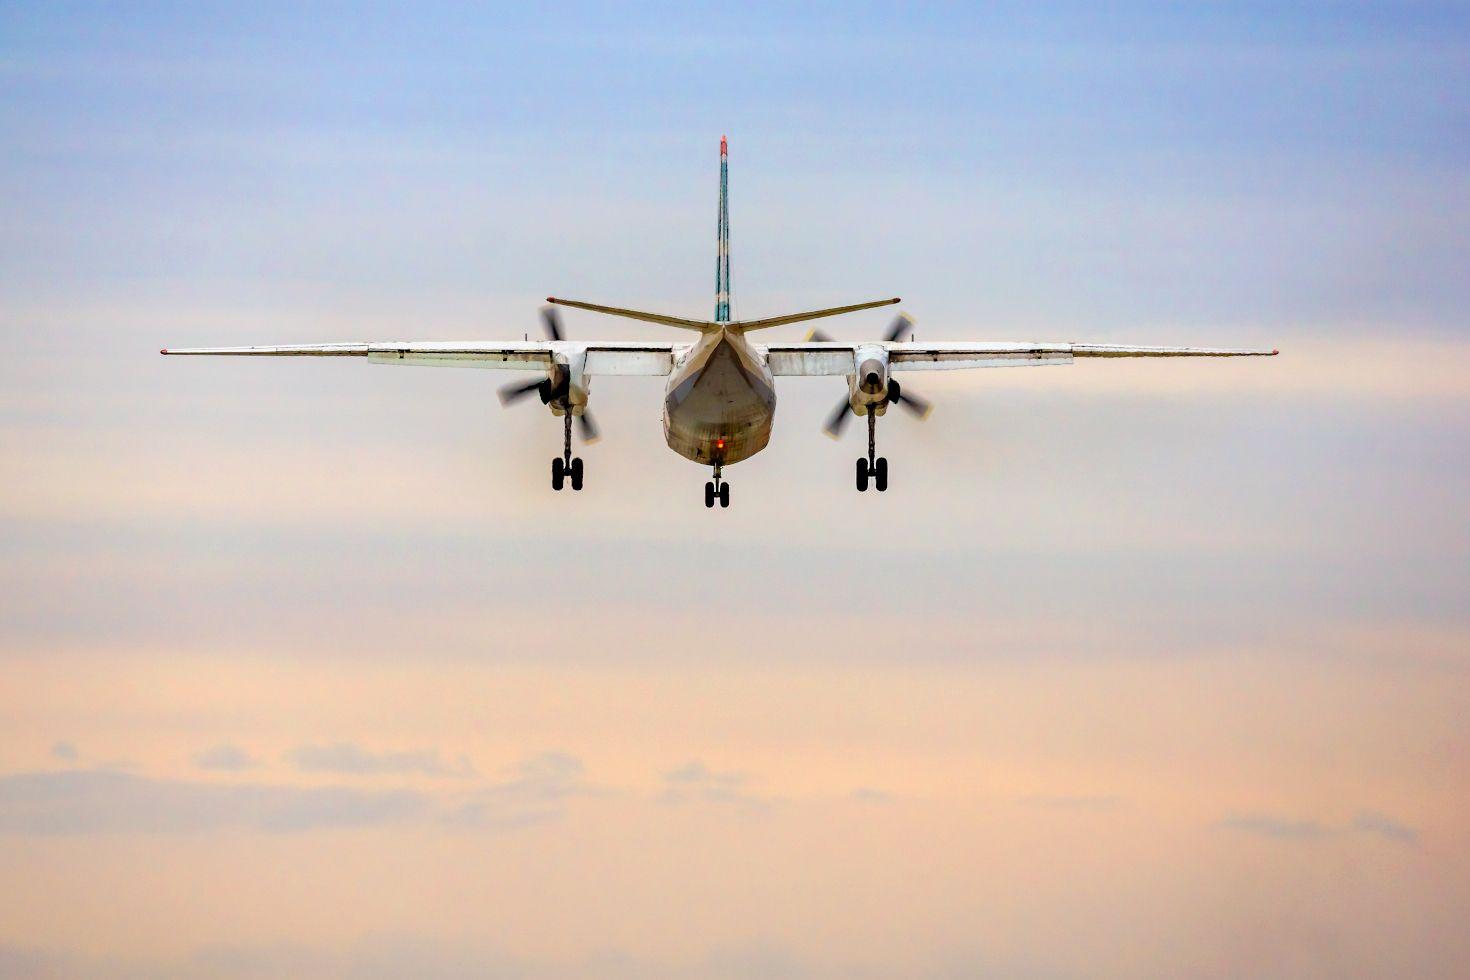 вид с хвоста ) споттинг Russia Siberia Irkutsk Россия Сибирь Иркутск spotting airline aircraft airplane